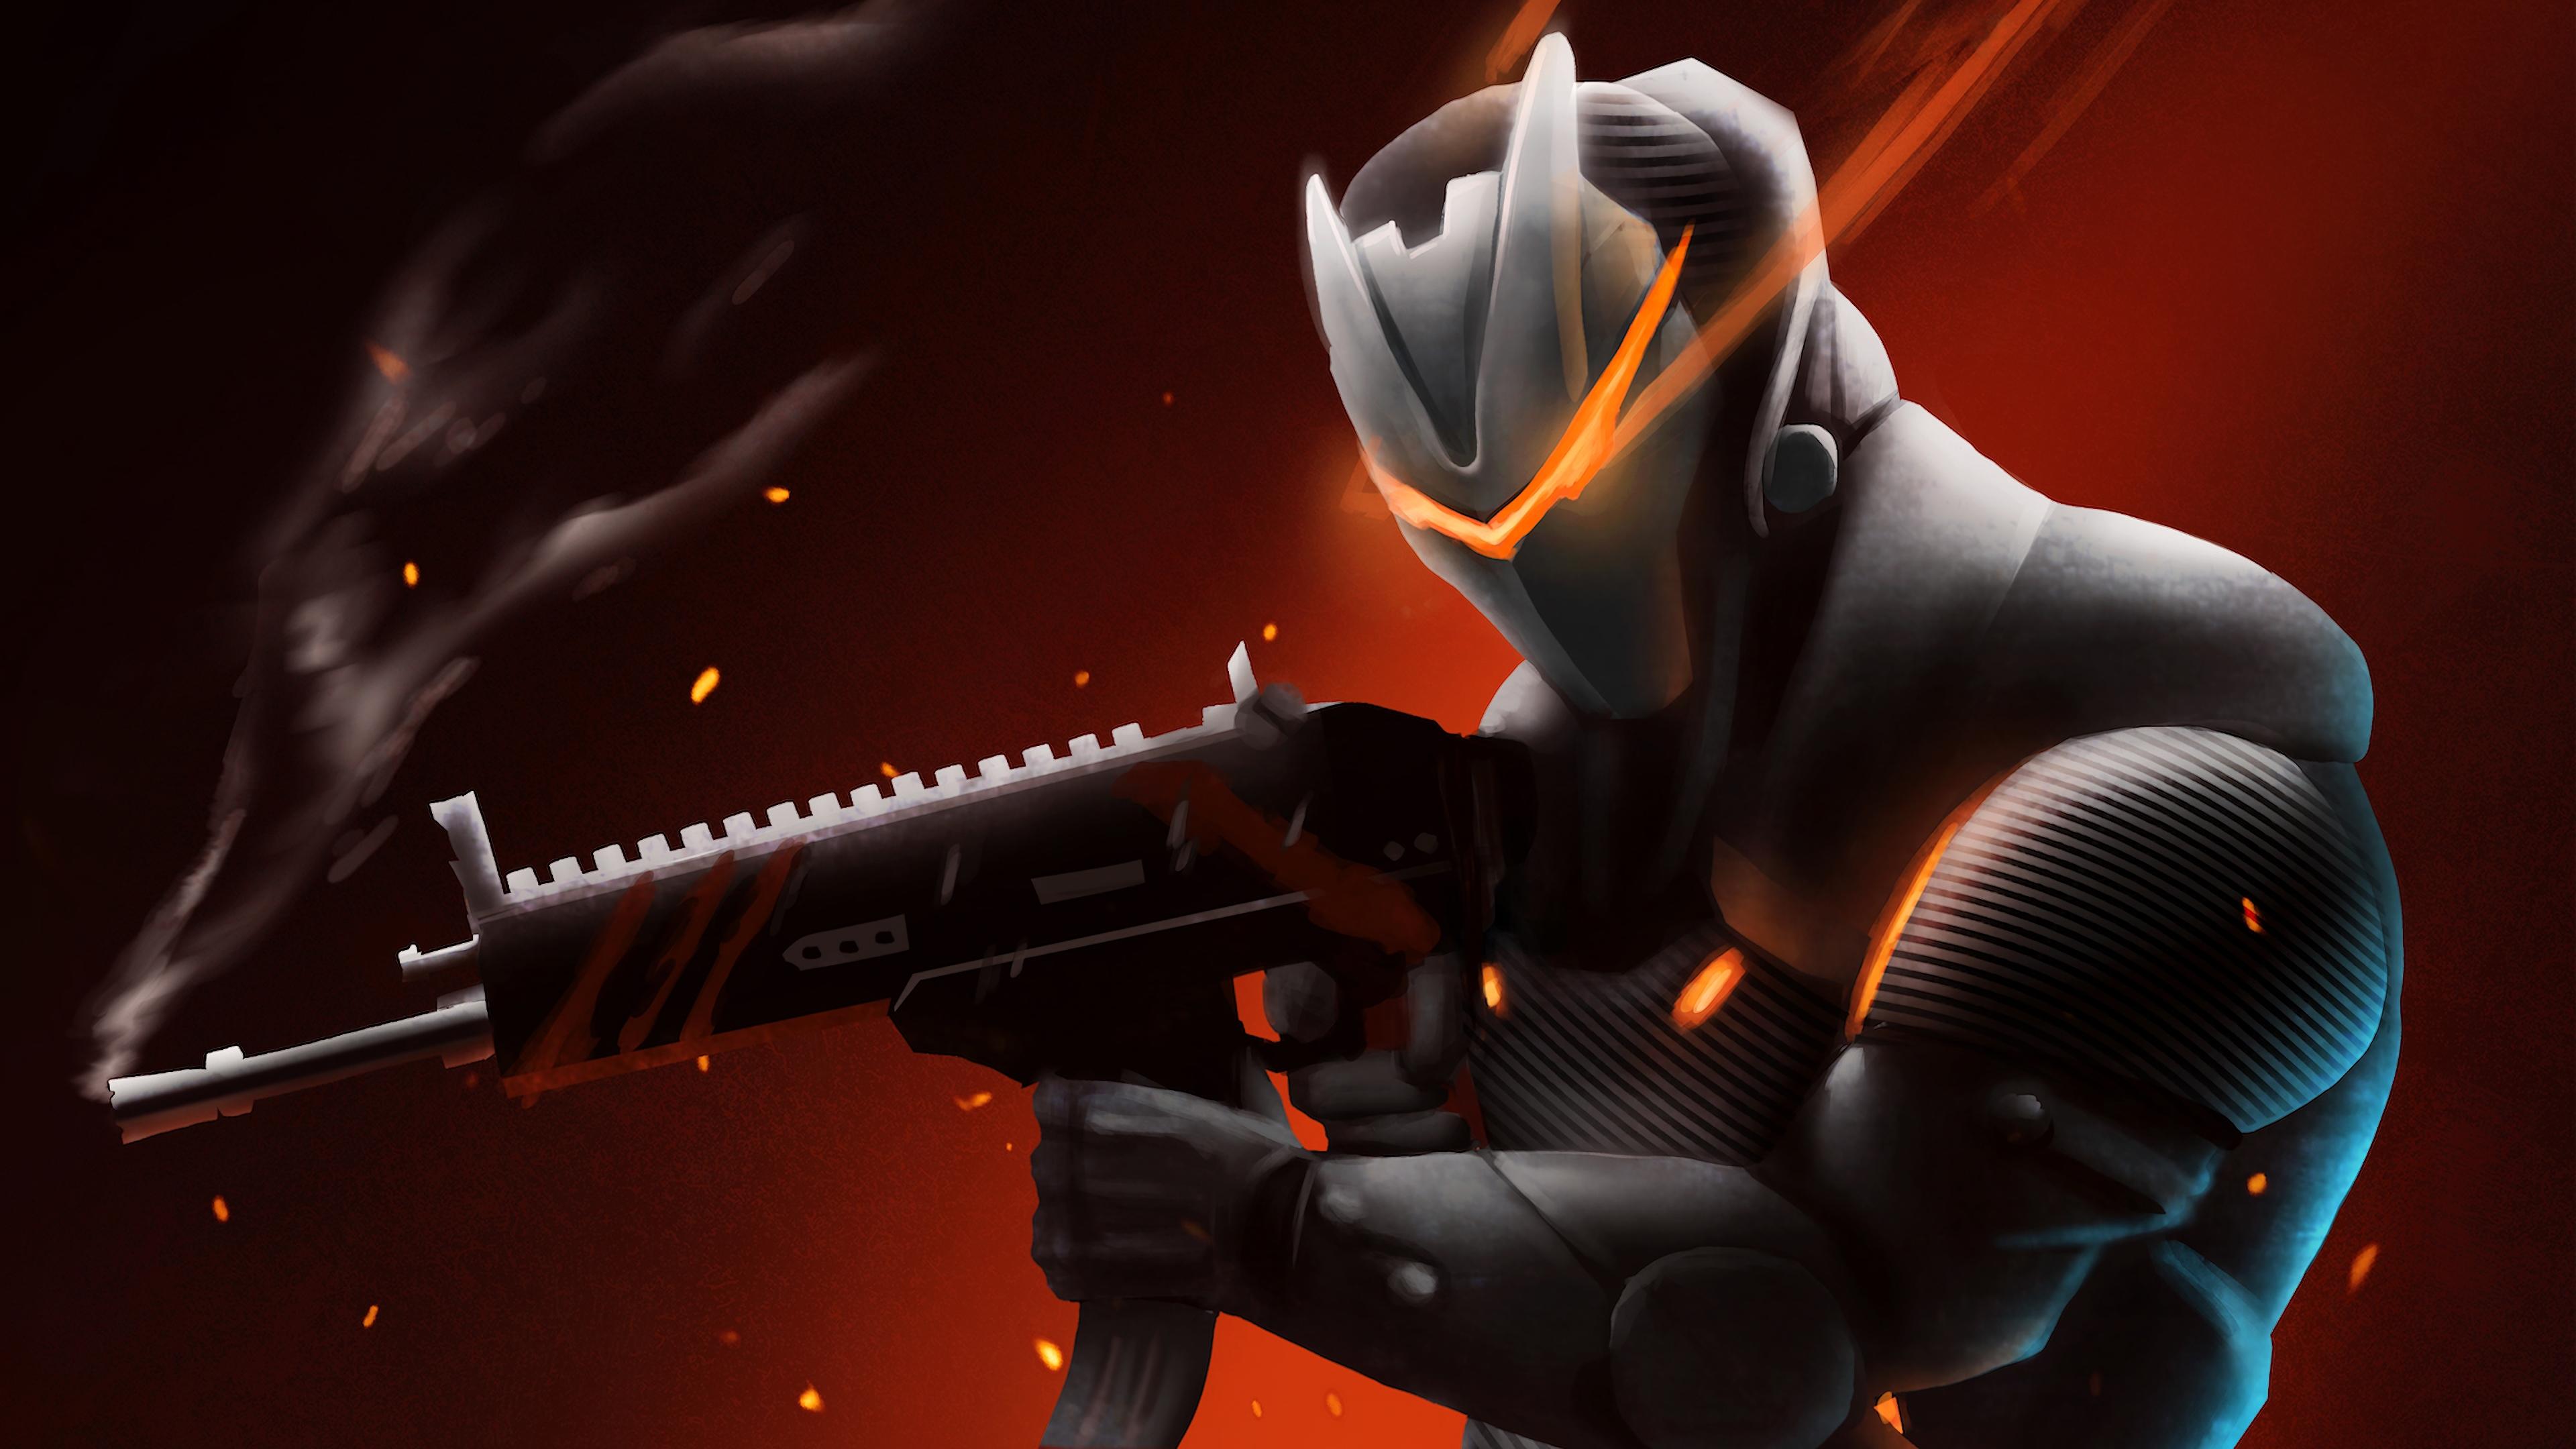 Desktop Wallpaper 2018 Video Game Fortnite Art Hd: Omega With Rifle Fortnite Battle Royale Ps Games